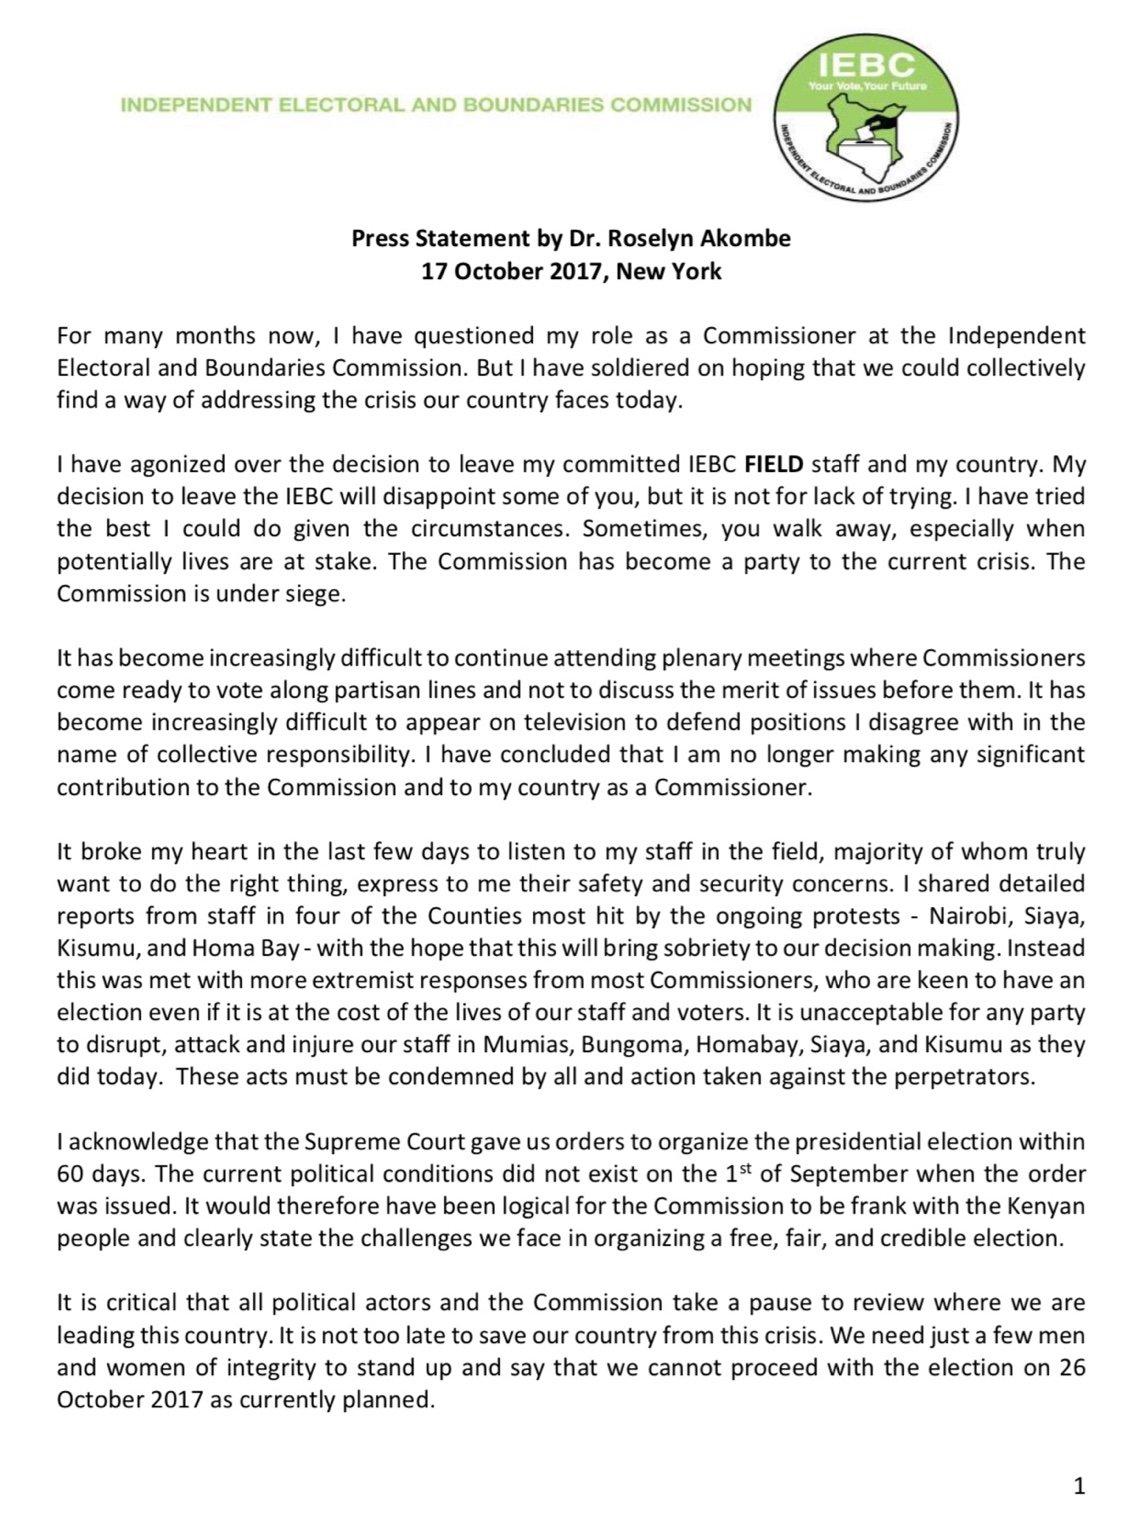 kenya dr roselyn akombe s resignation letter as iebc commissioner